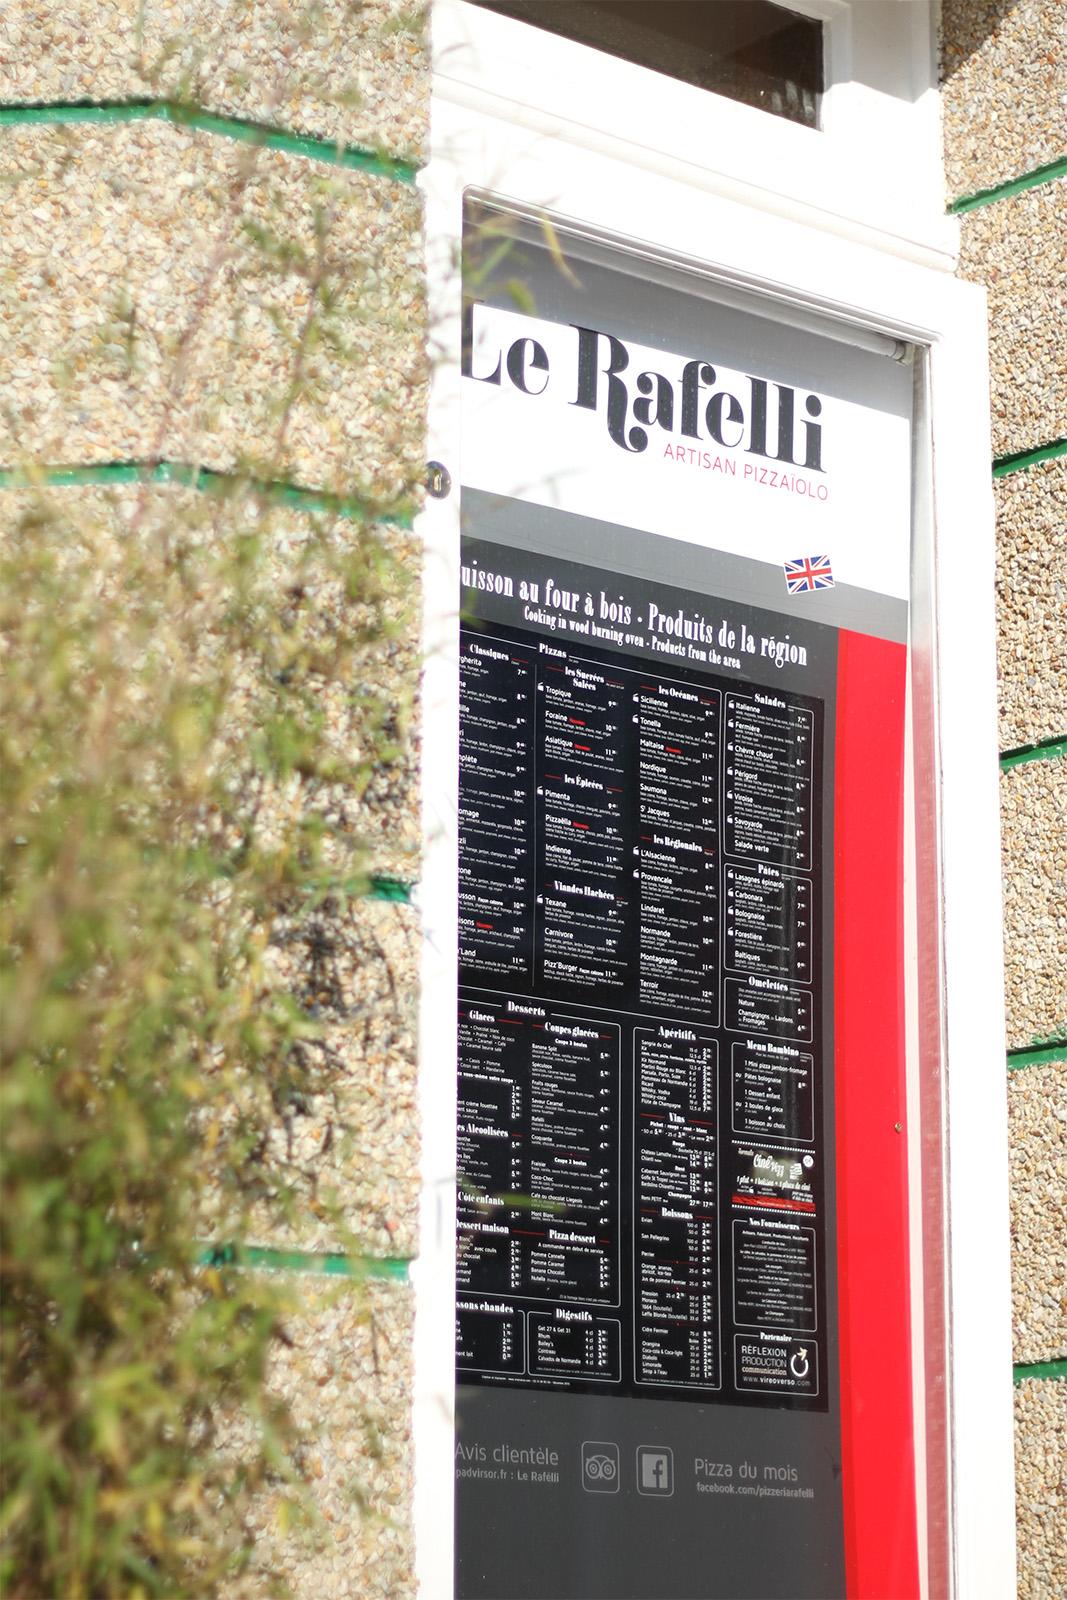 le-rafelli-pizzeria-restaurant-logo-menu-exterieur